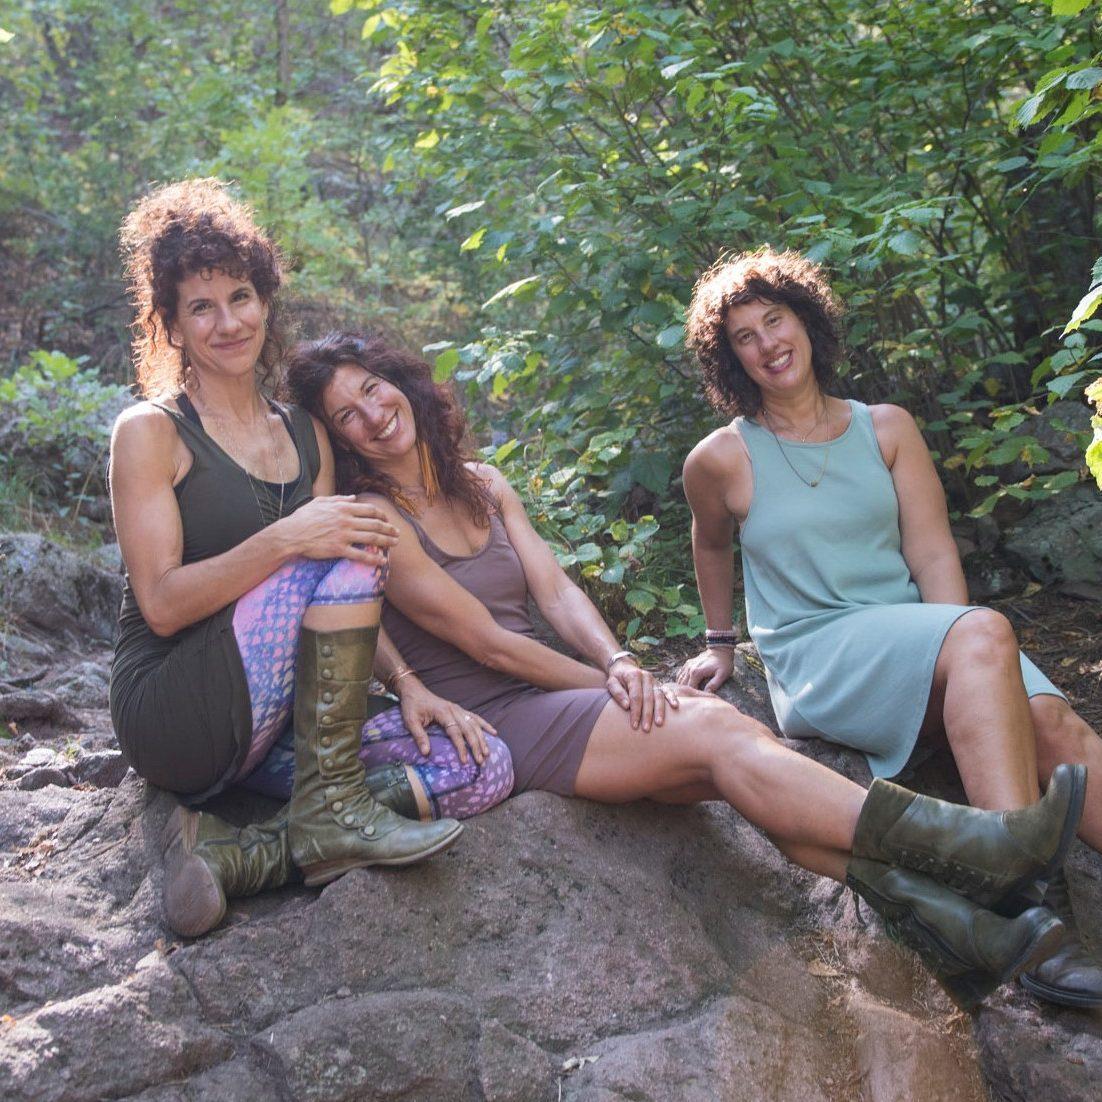 Jessica, Jill and Jennifer Emich: Shine Community | Episode 25